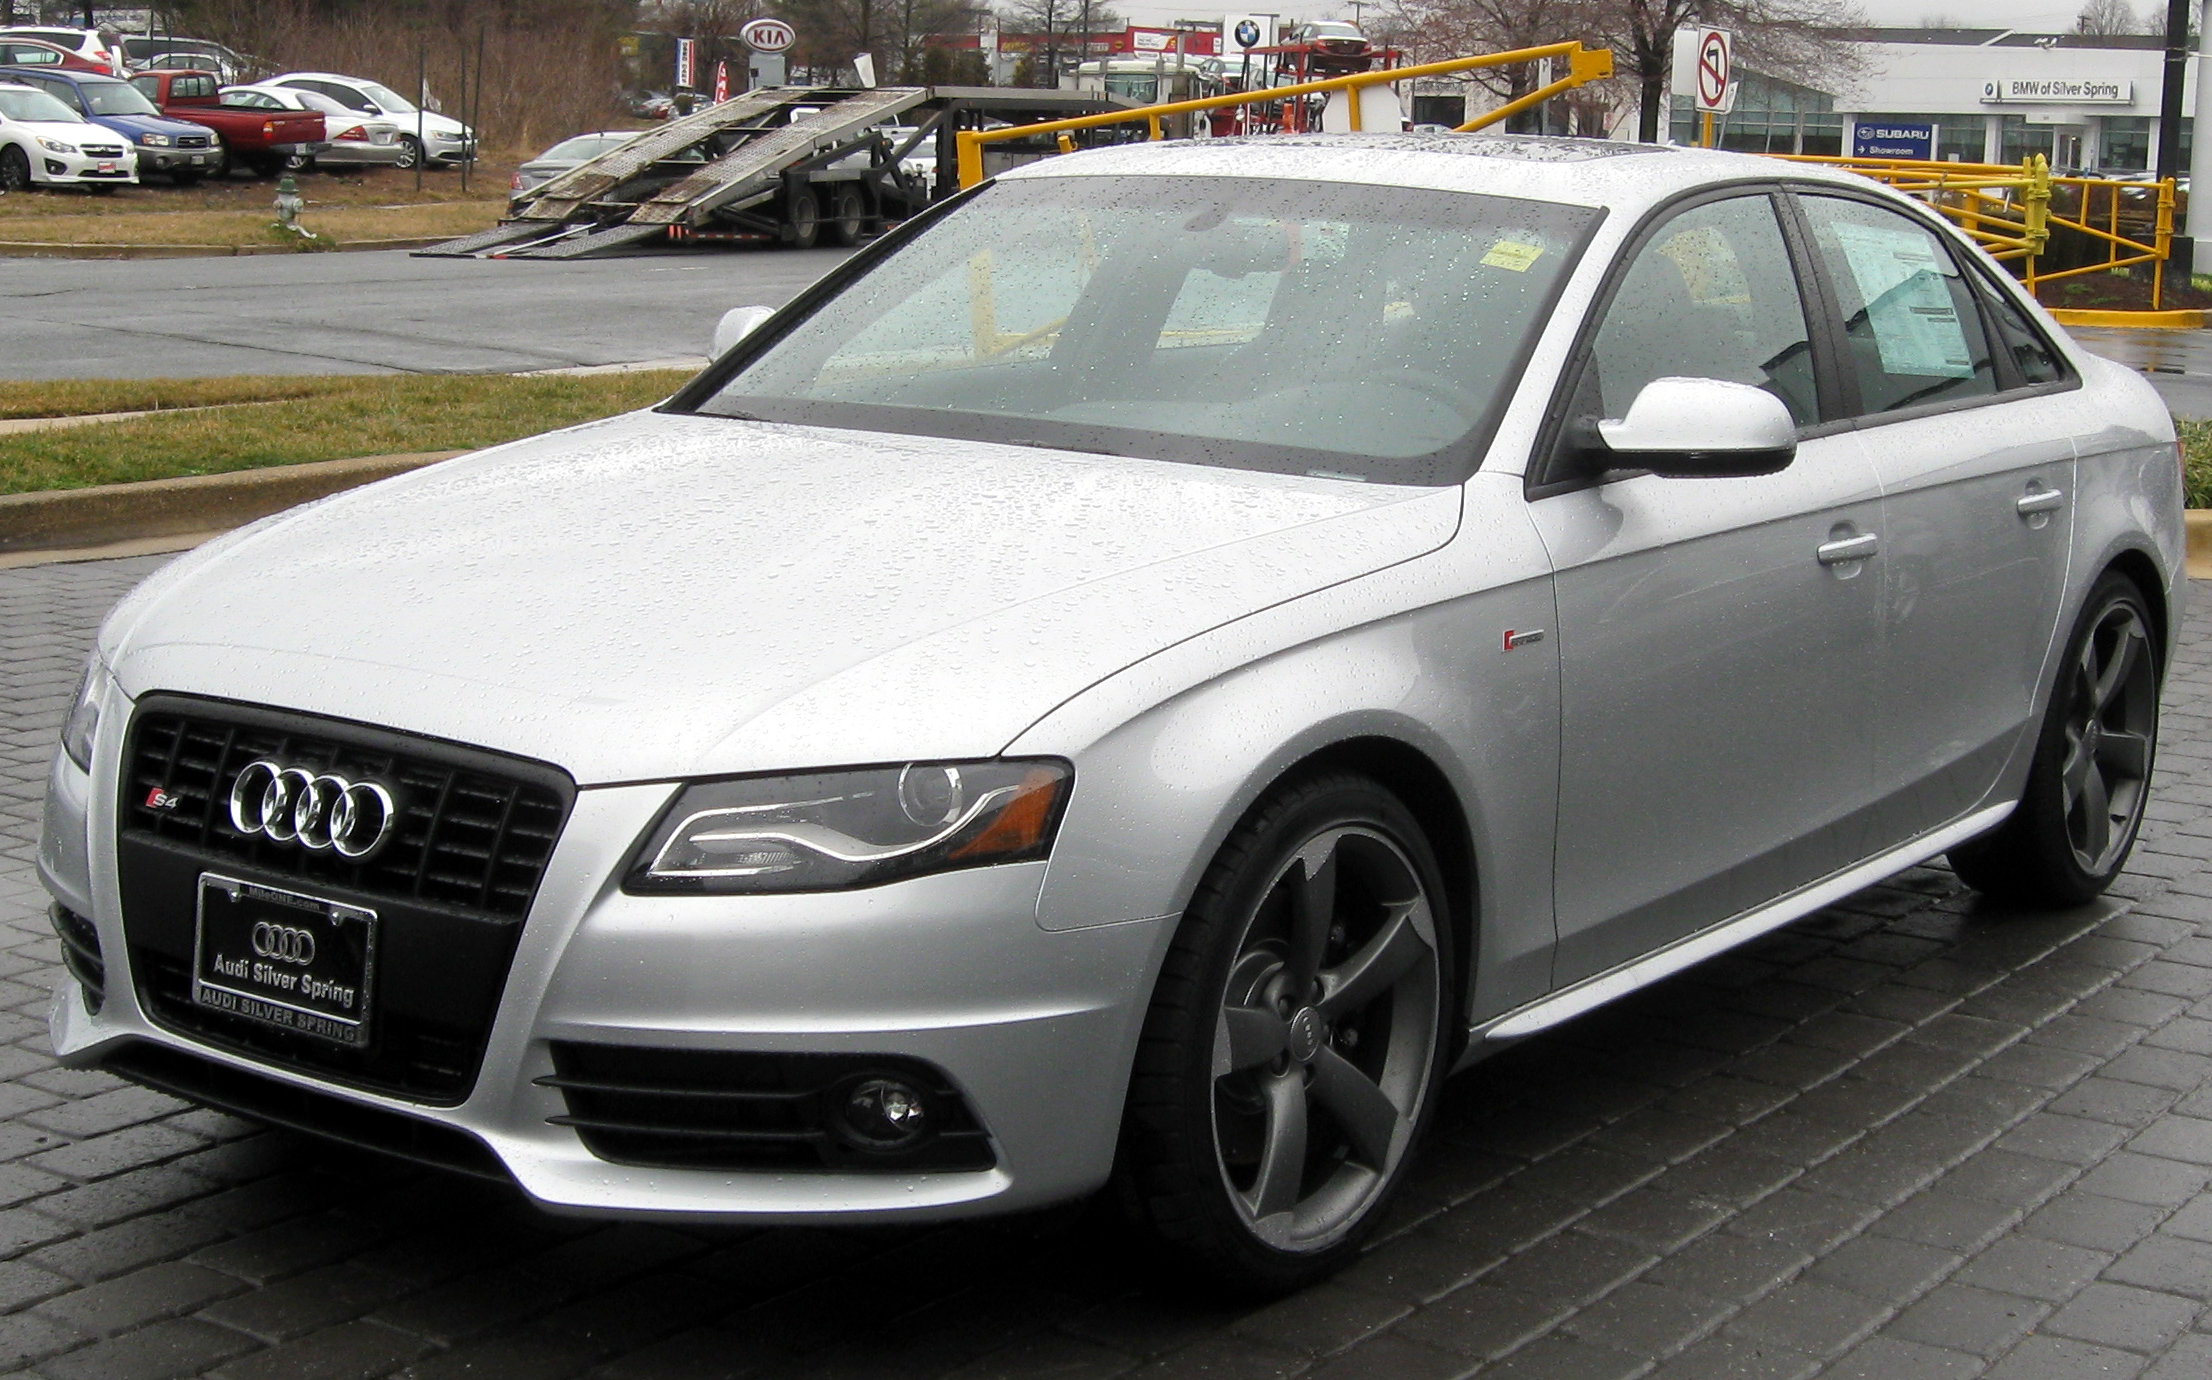 2012 Audi S4 Image 18